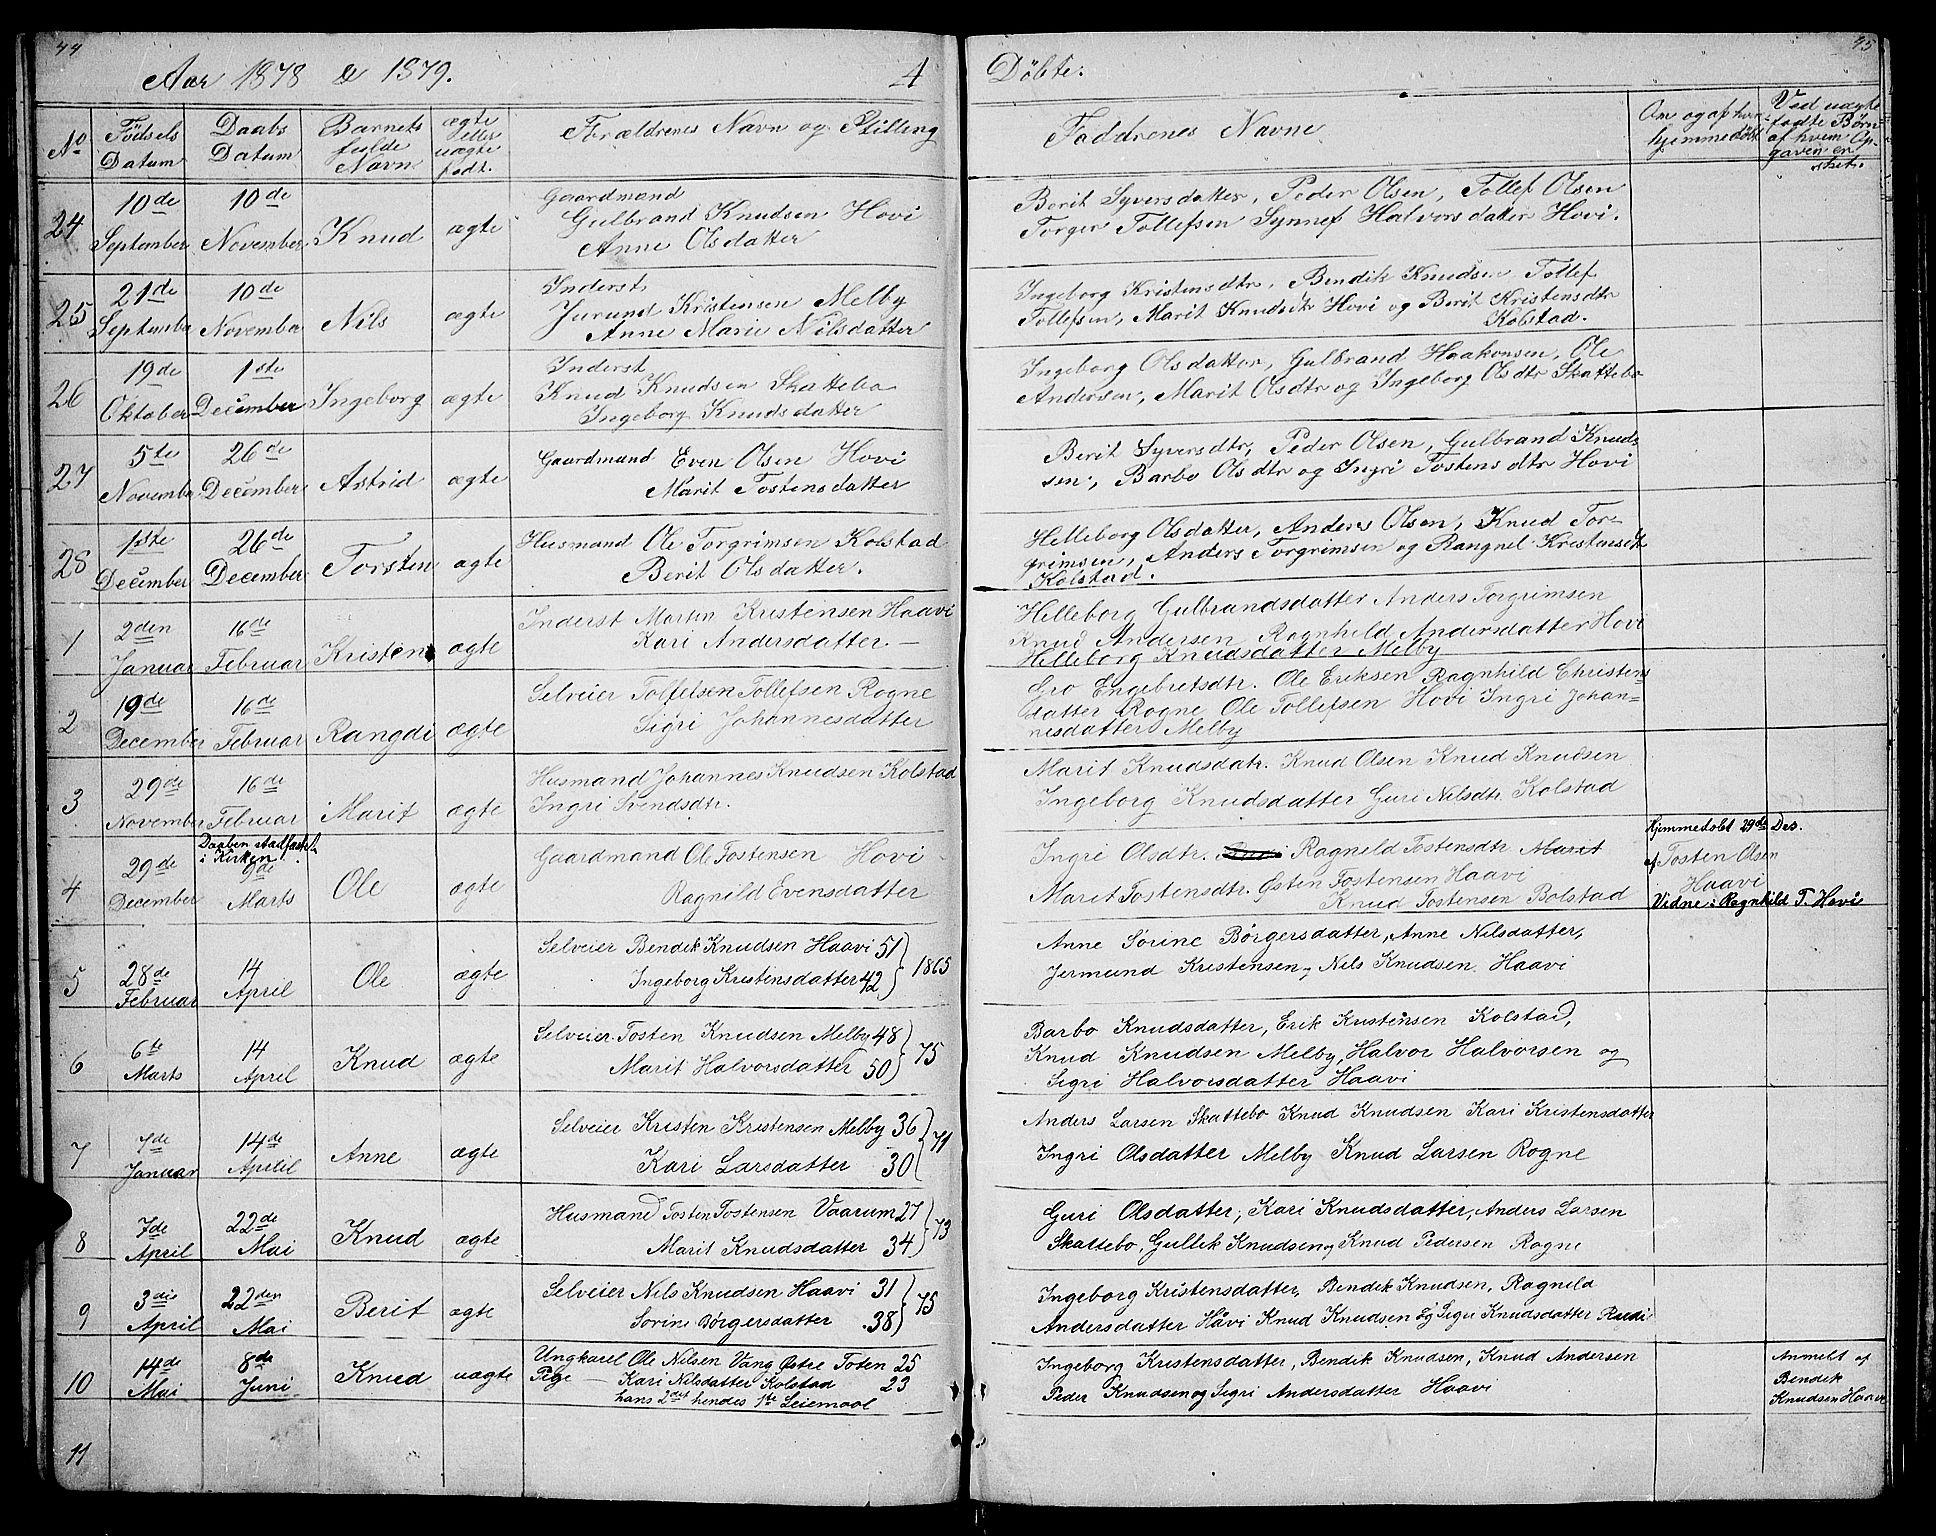 SAH, Øystre Slidre prestekontor, Klokkerbok nr. 3, 1866-1886, s. 44-45